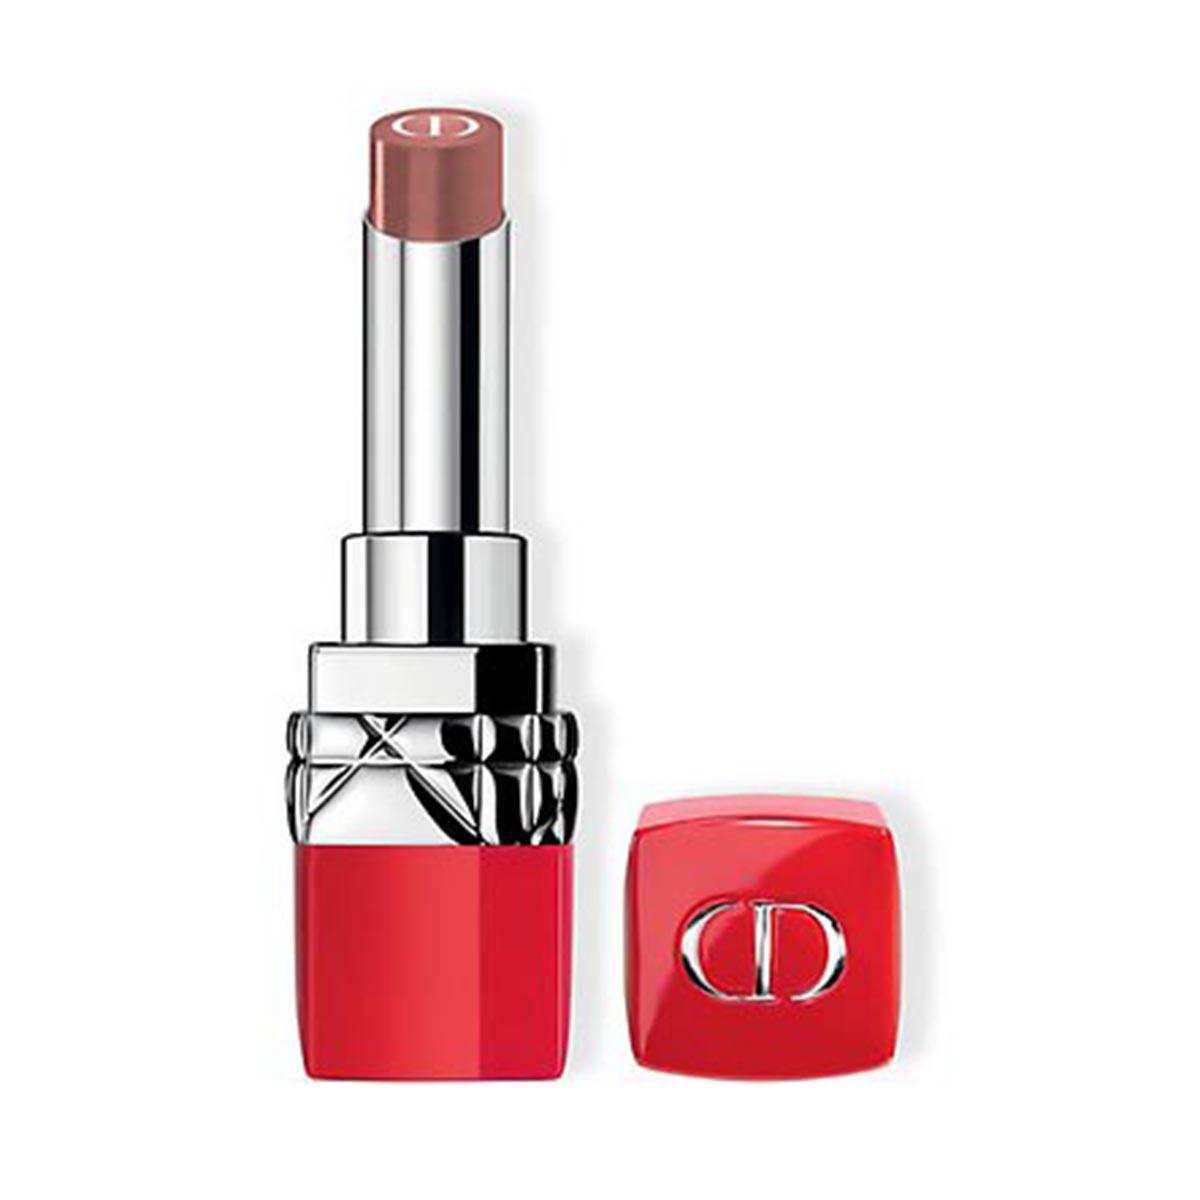 Dior rouge dior ultra care lipstick 848 whisper